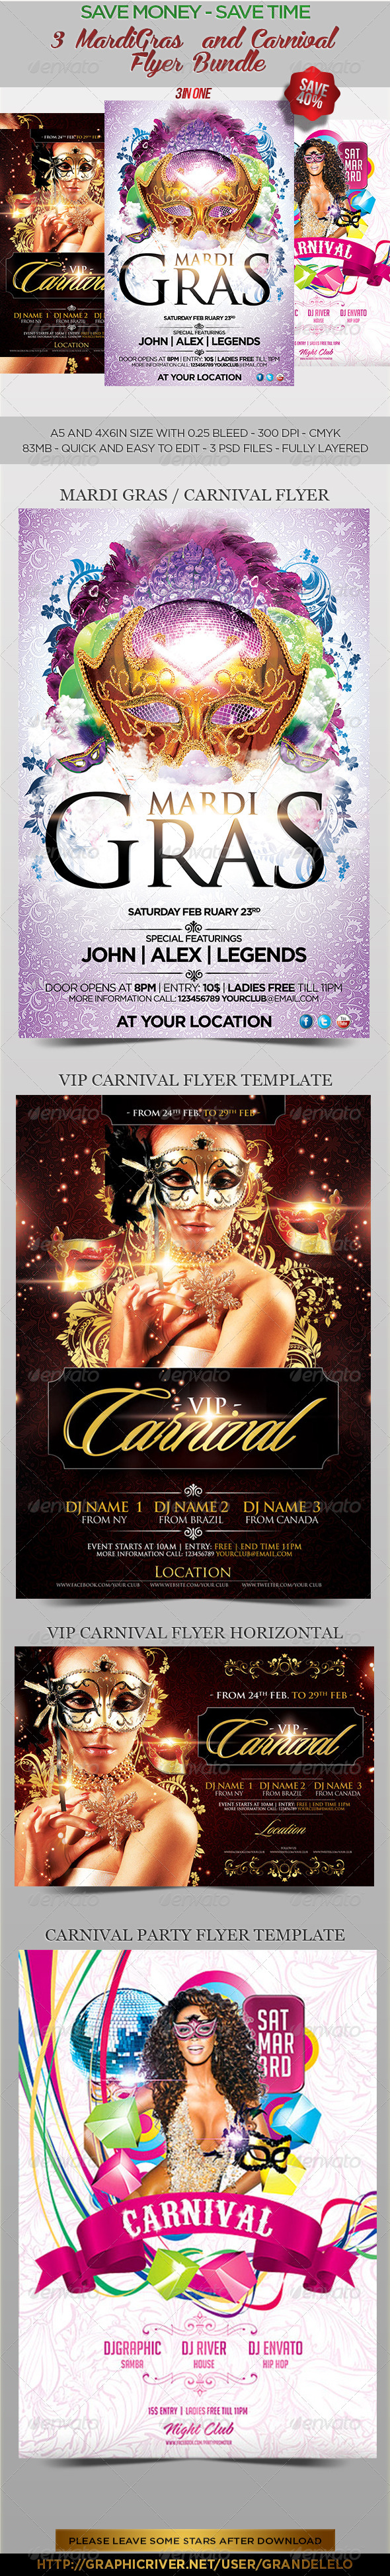 3 MardiGras n Carnival  Flyer Bundle - Events Flyers